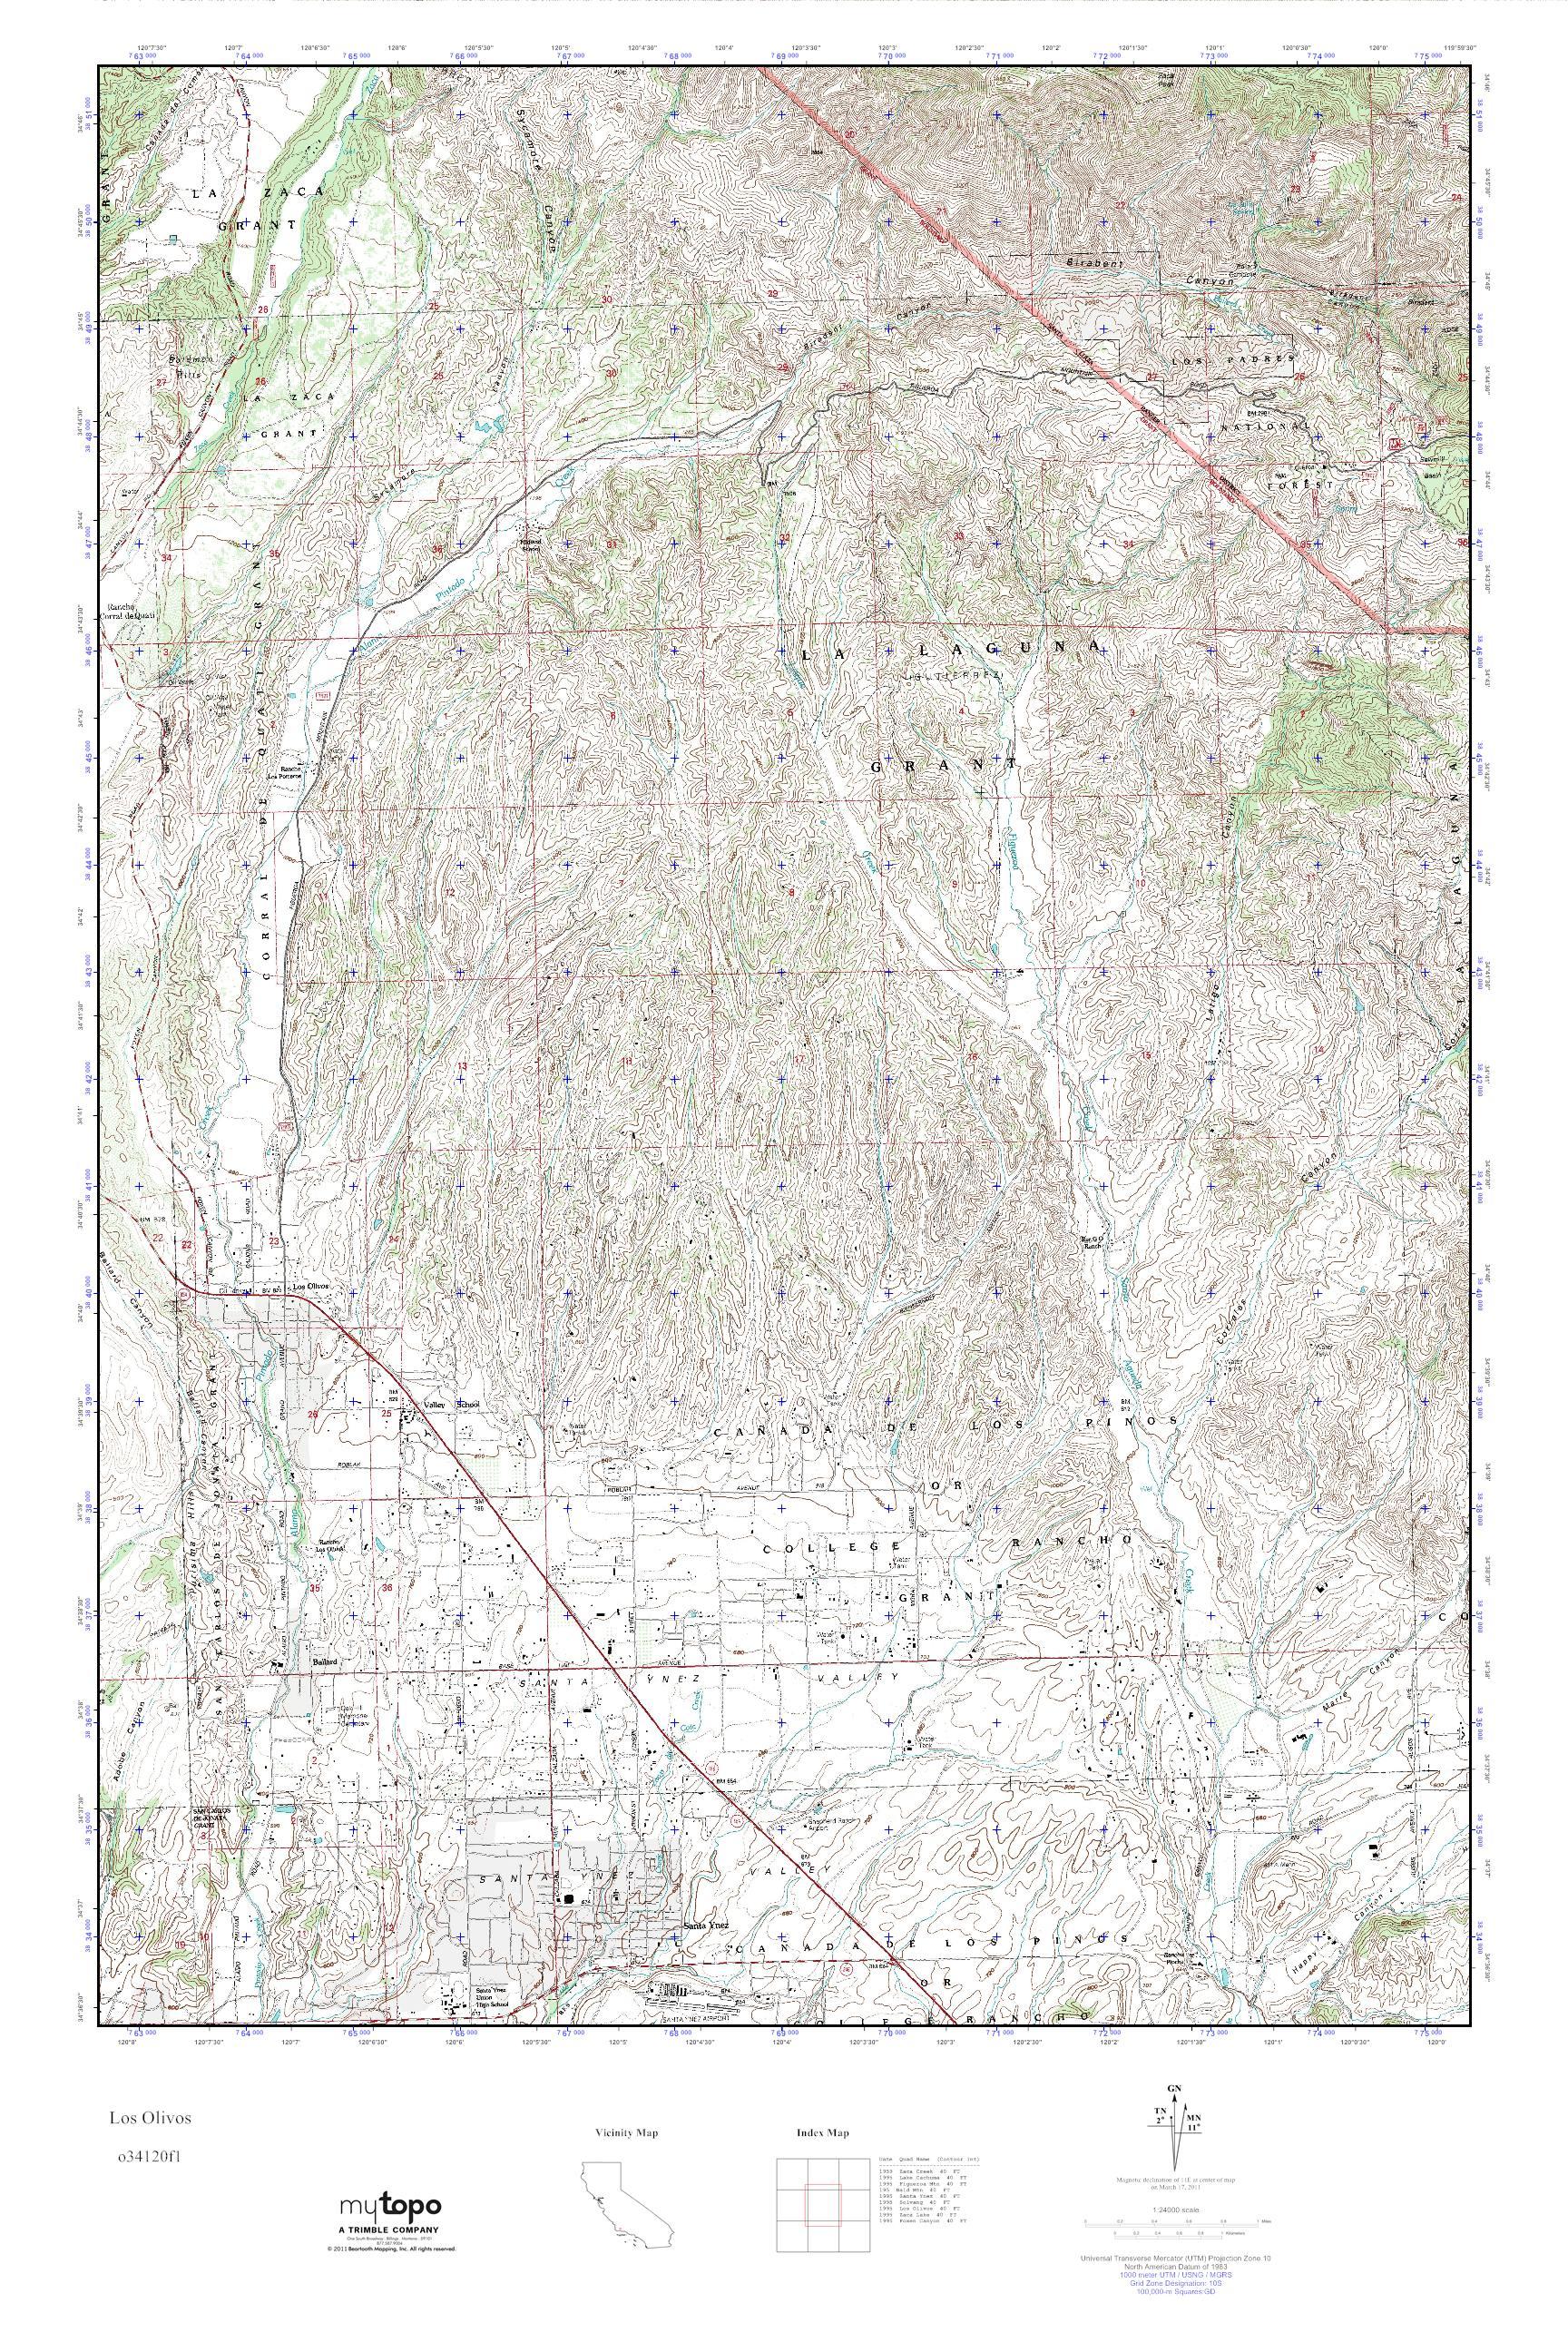 MyTopo Los Olivos, California USGS Quad Topo Map on